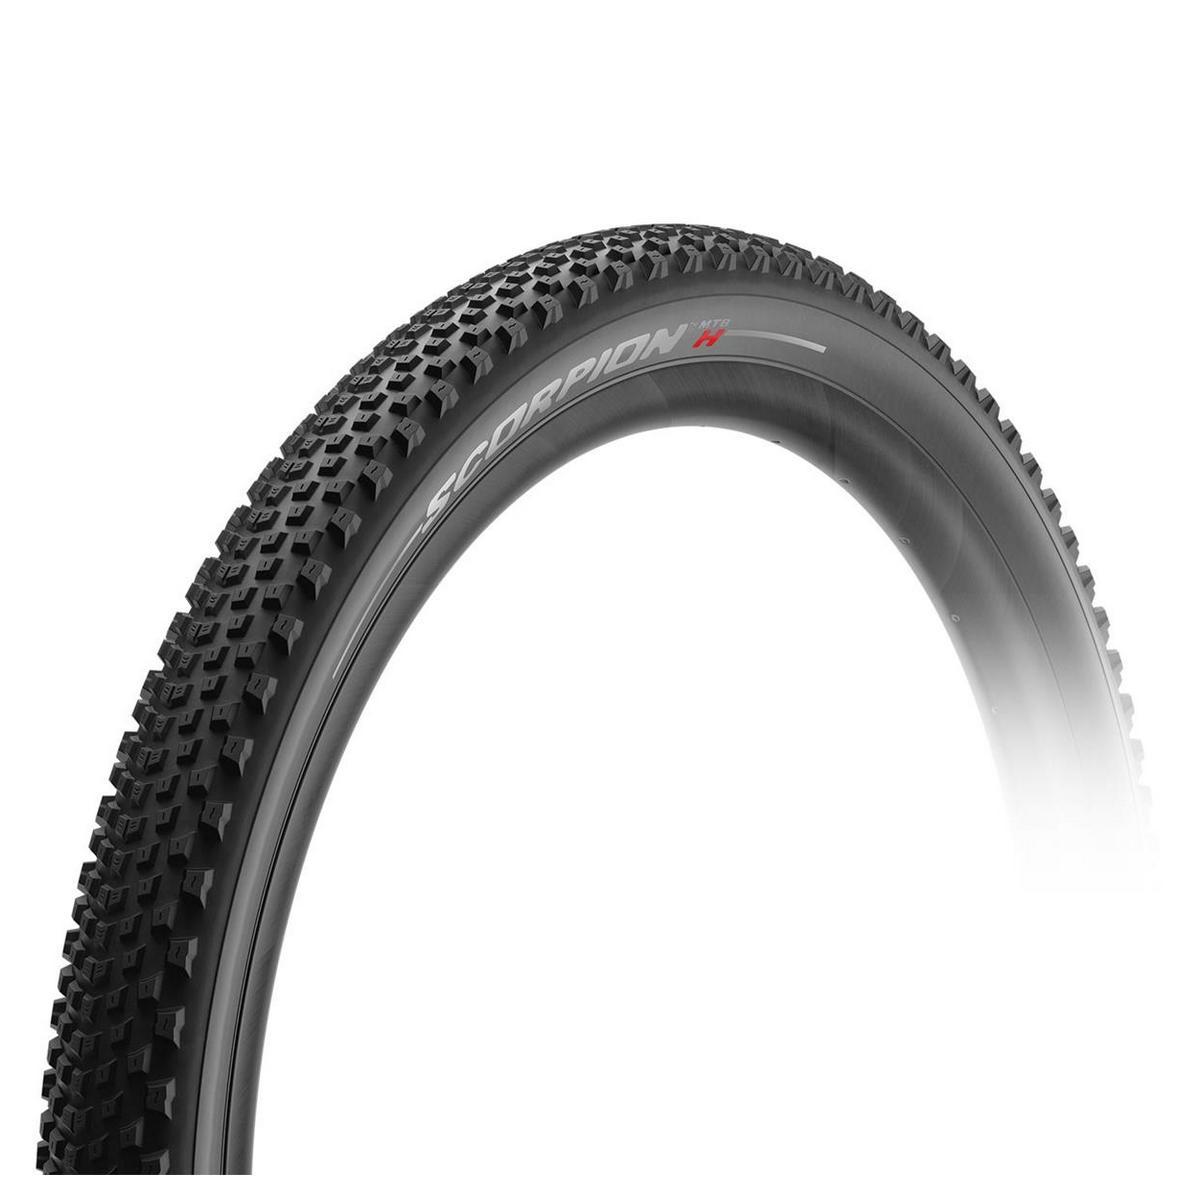 Tire Mtb Scorpion Hard Terrain Lite 29x2.40'' Tubeless Ready Black